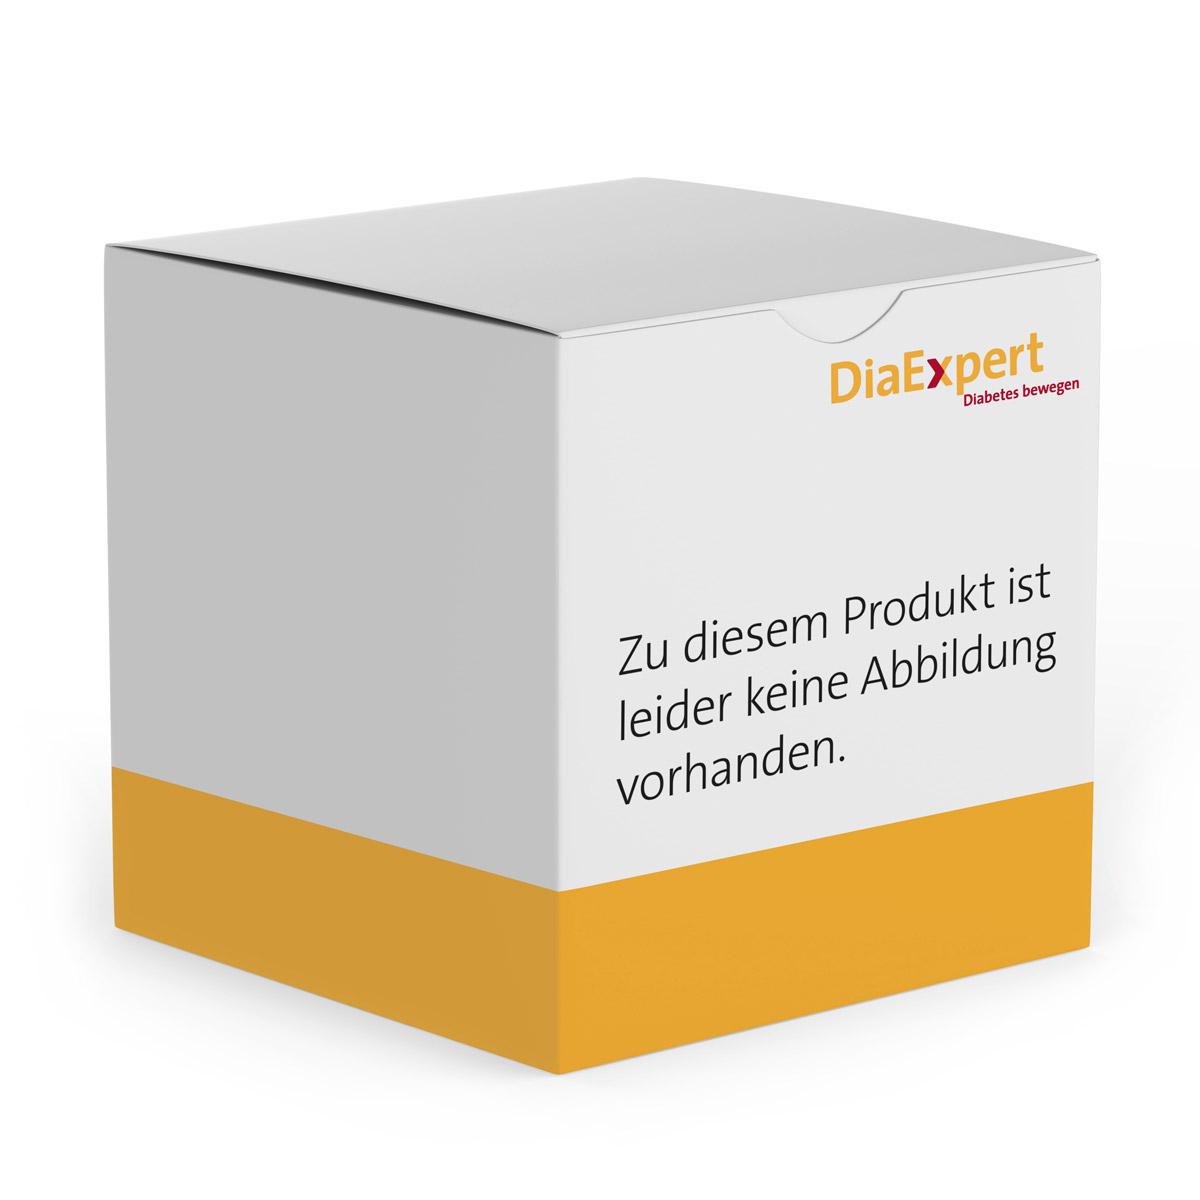 FreeStyle Precision ß-Ketone Teststreifen in Orginalverpackung